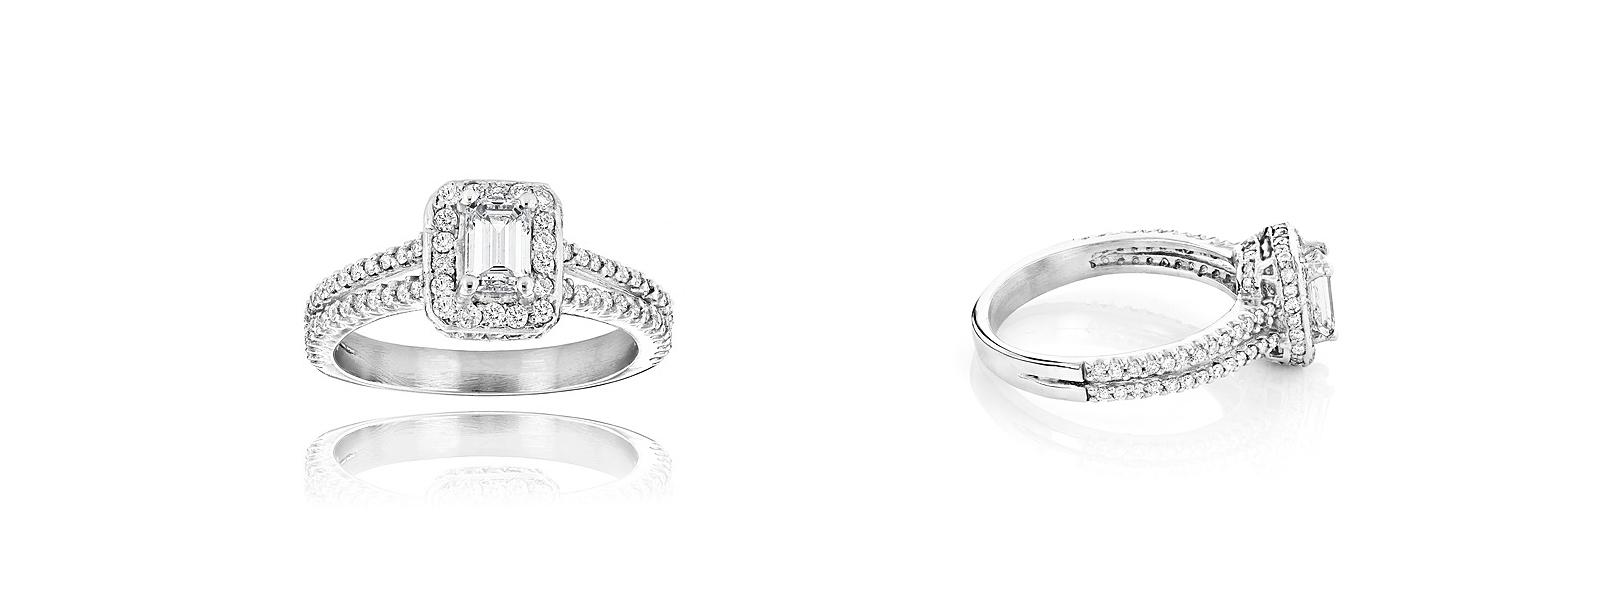 platinum diamond ring platin diamant im smaragdschliff 1 21 ct wesselton wei ebay. Black Bedroom Furniture Sets. Home Design Ideas